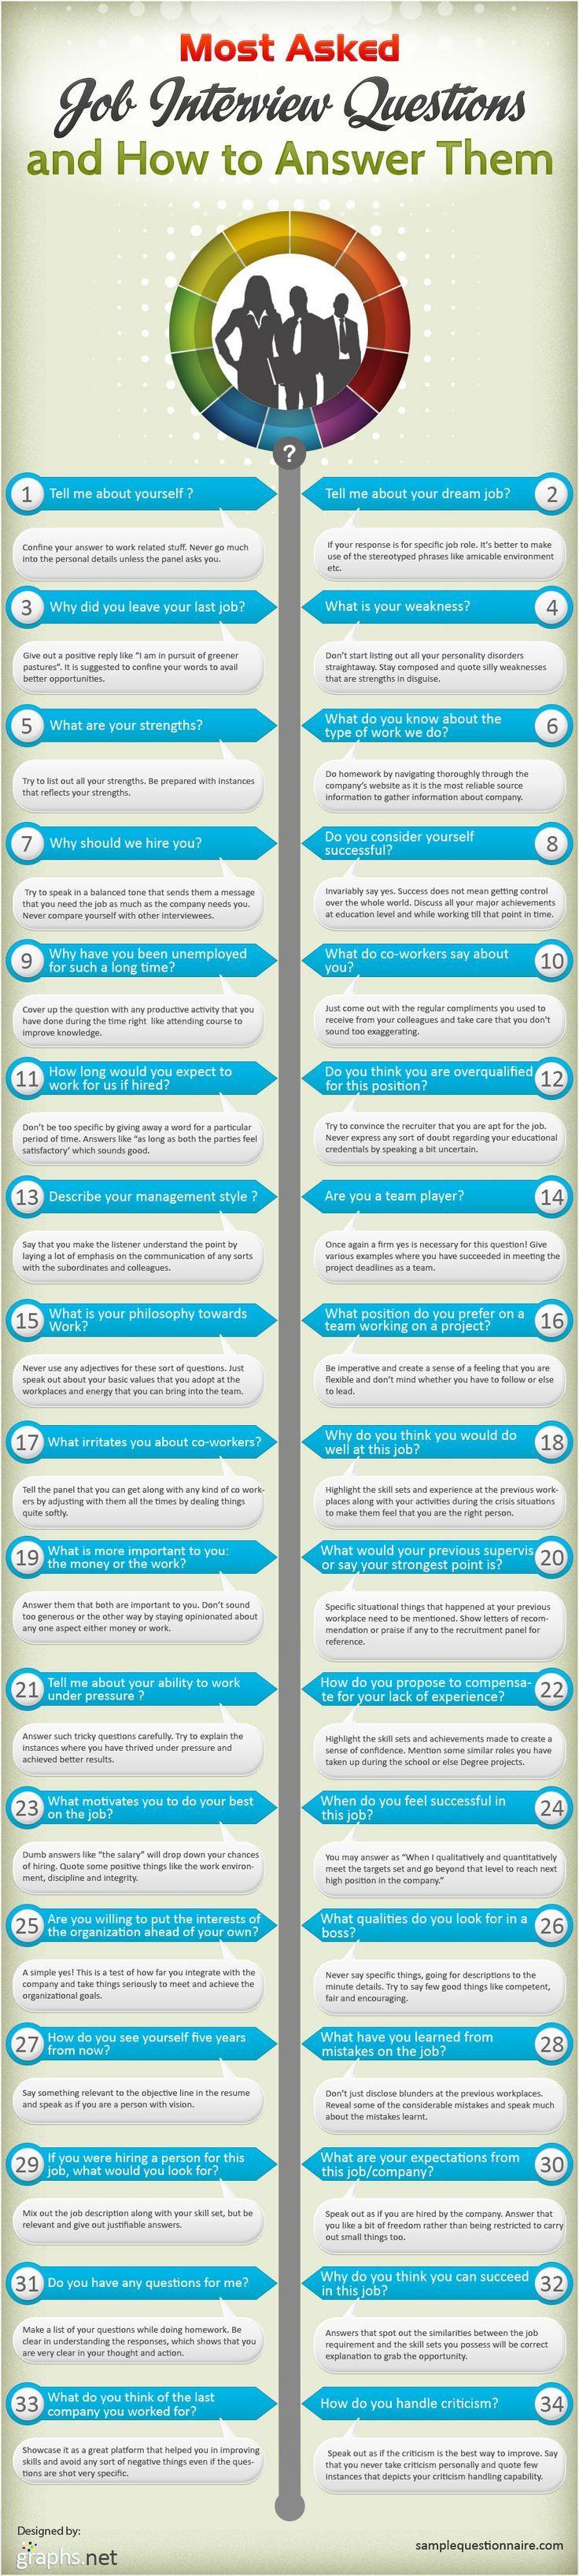 25+ best ideas about Interview questions on Pinterest | Job ...